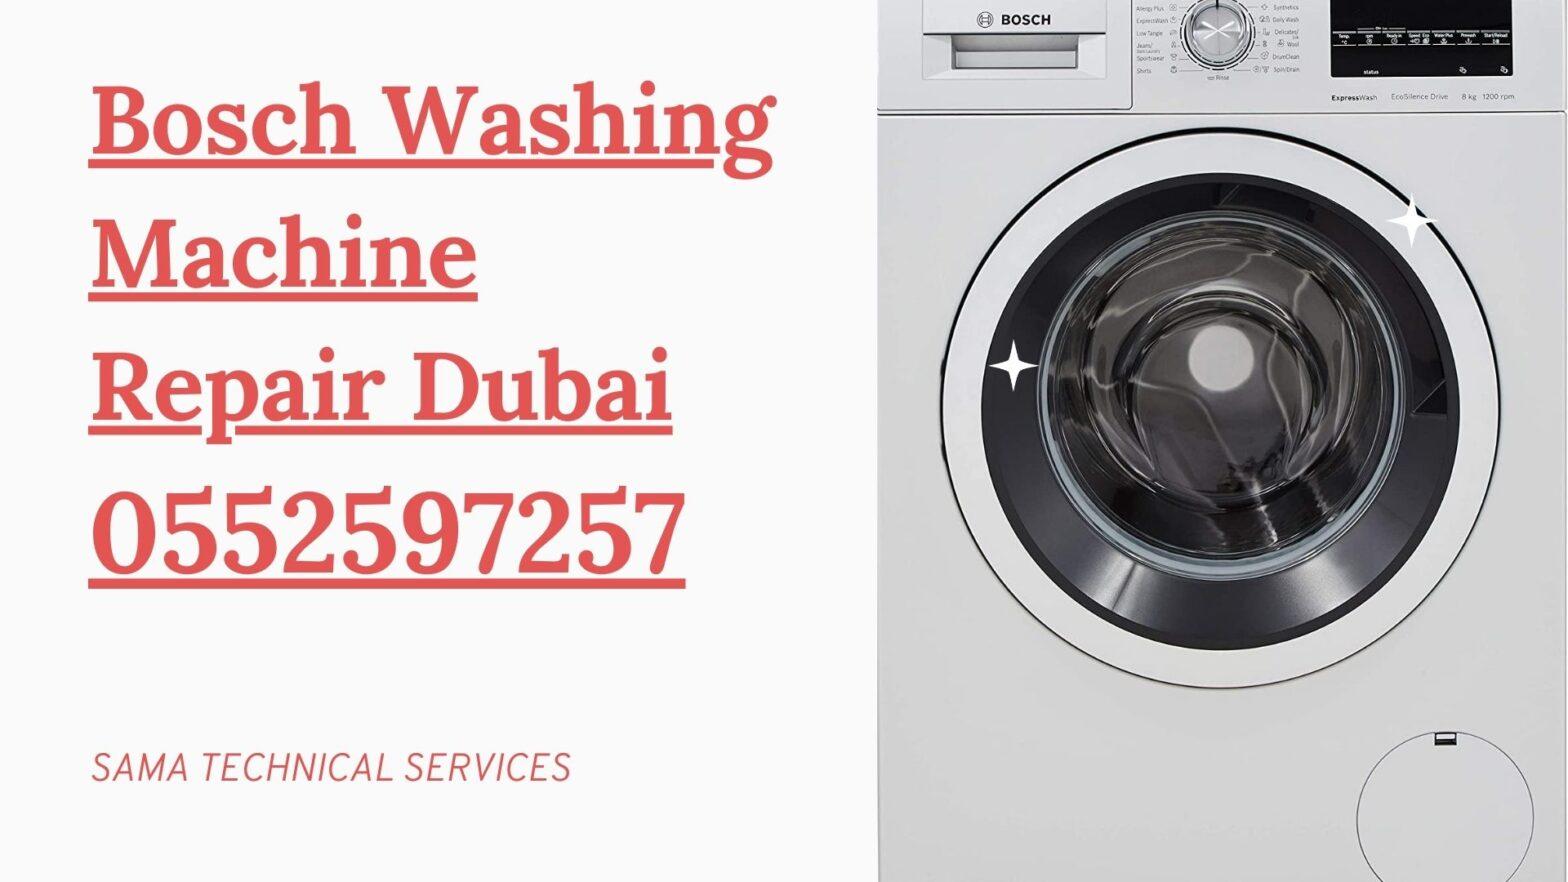 Bosch Washing machine repair Dubai